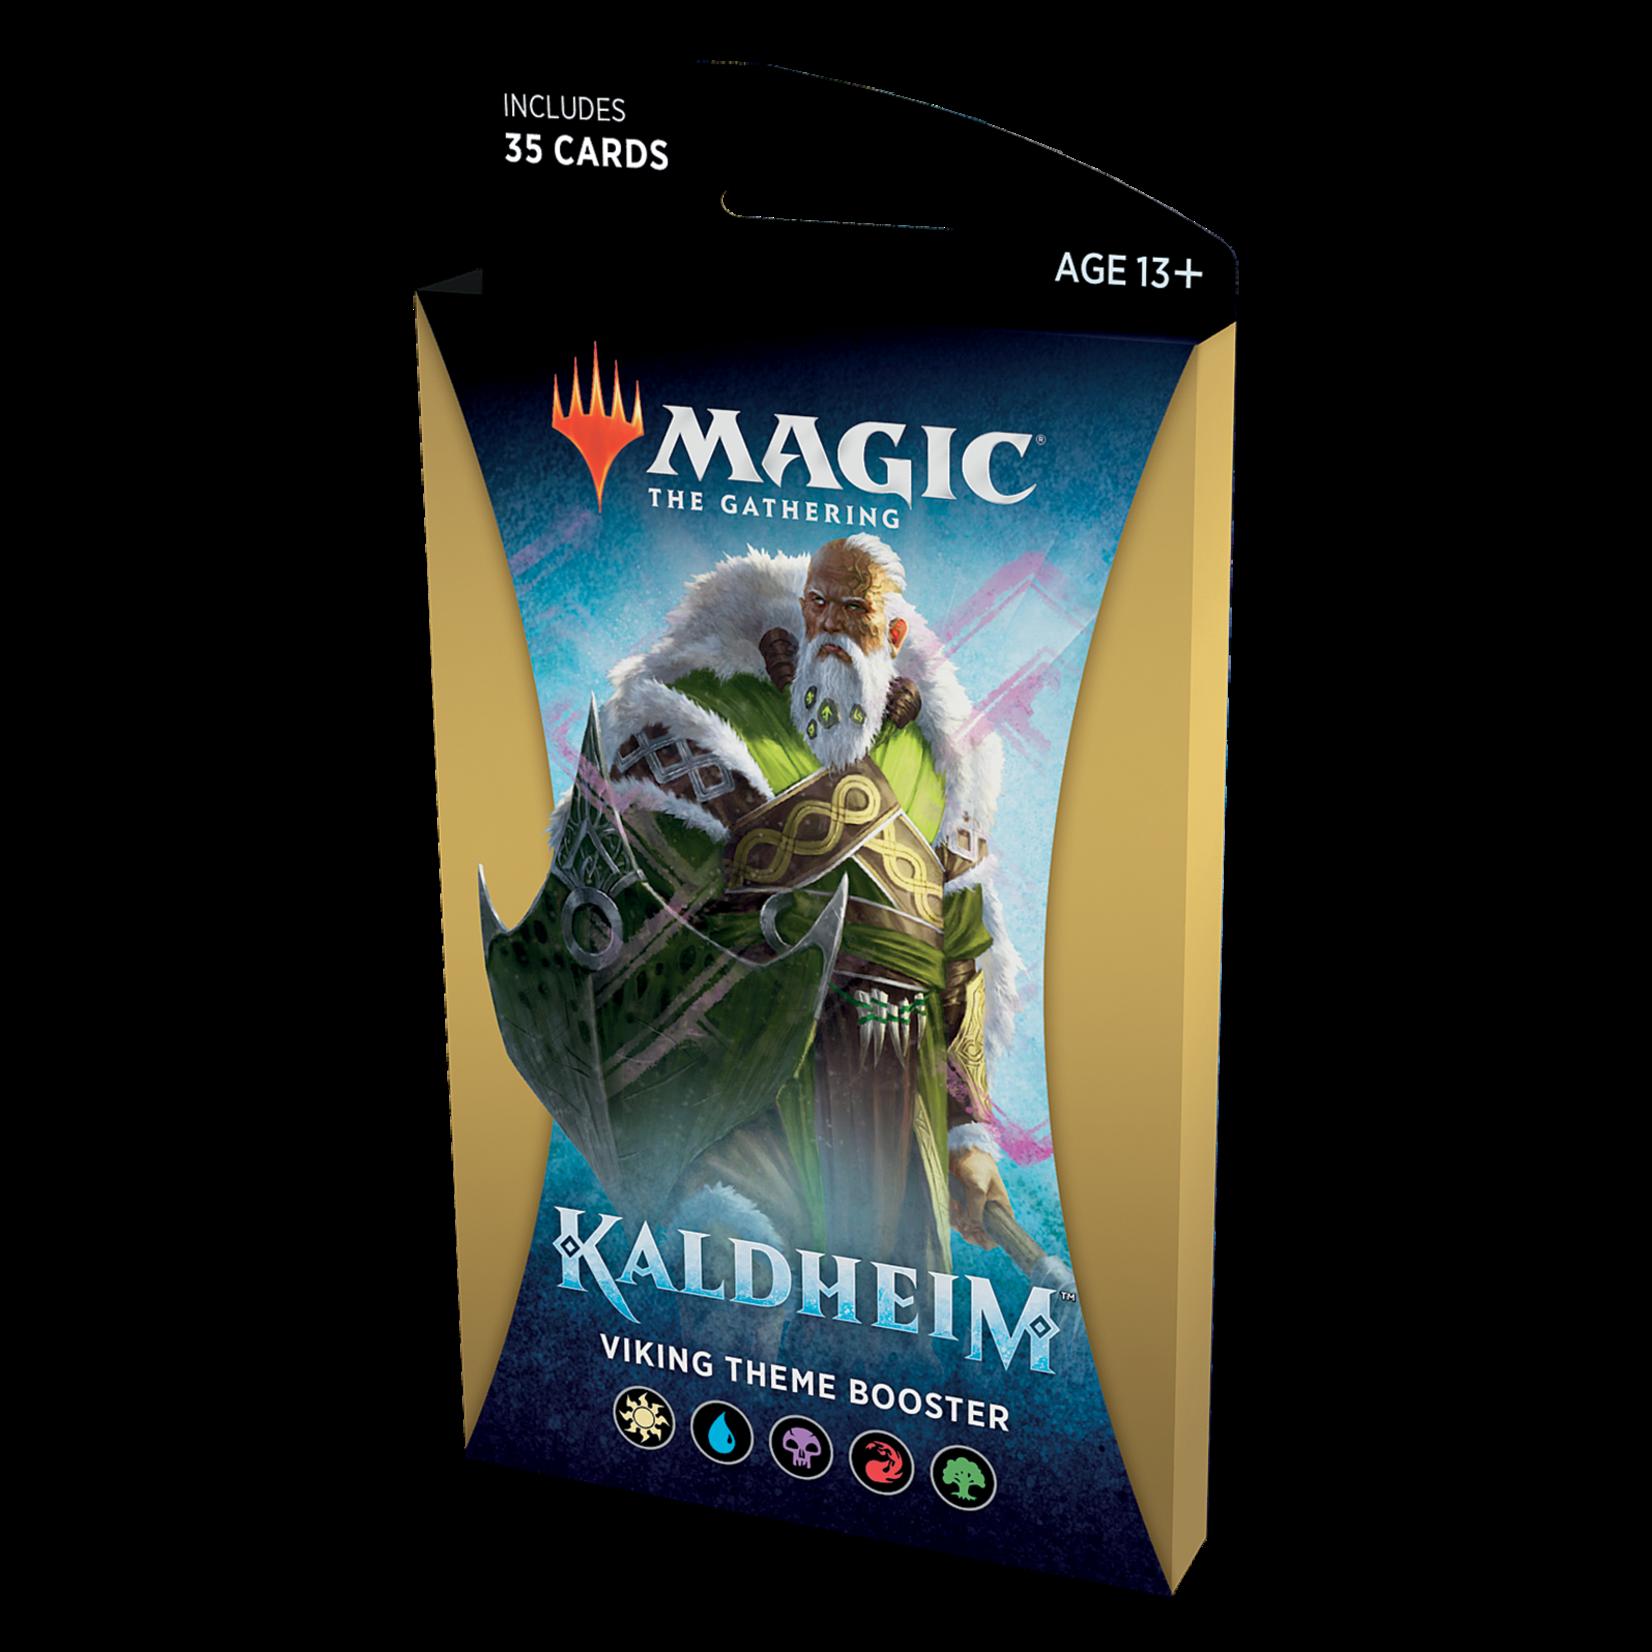 Magic: The Gathering Magic: The Gathering - Kaldheim Theme Booster Pack: Viking